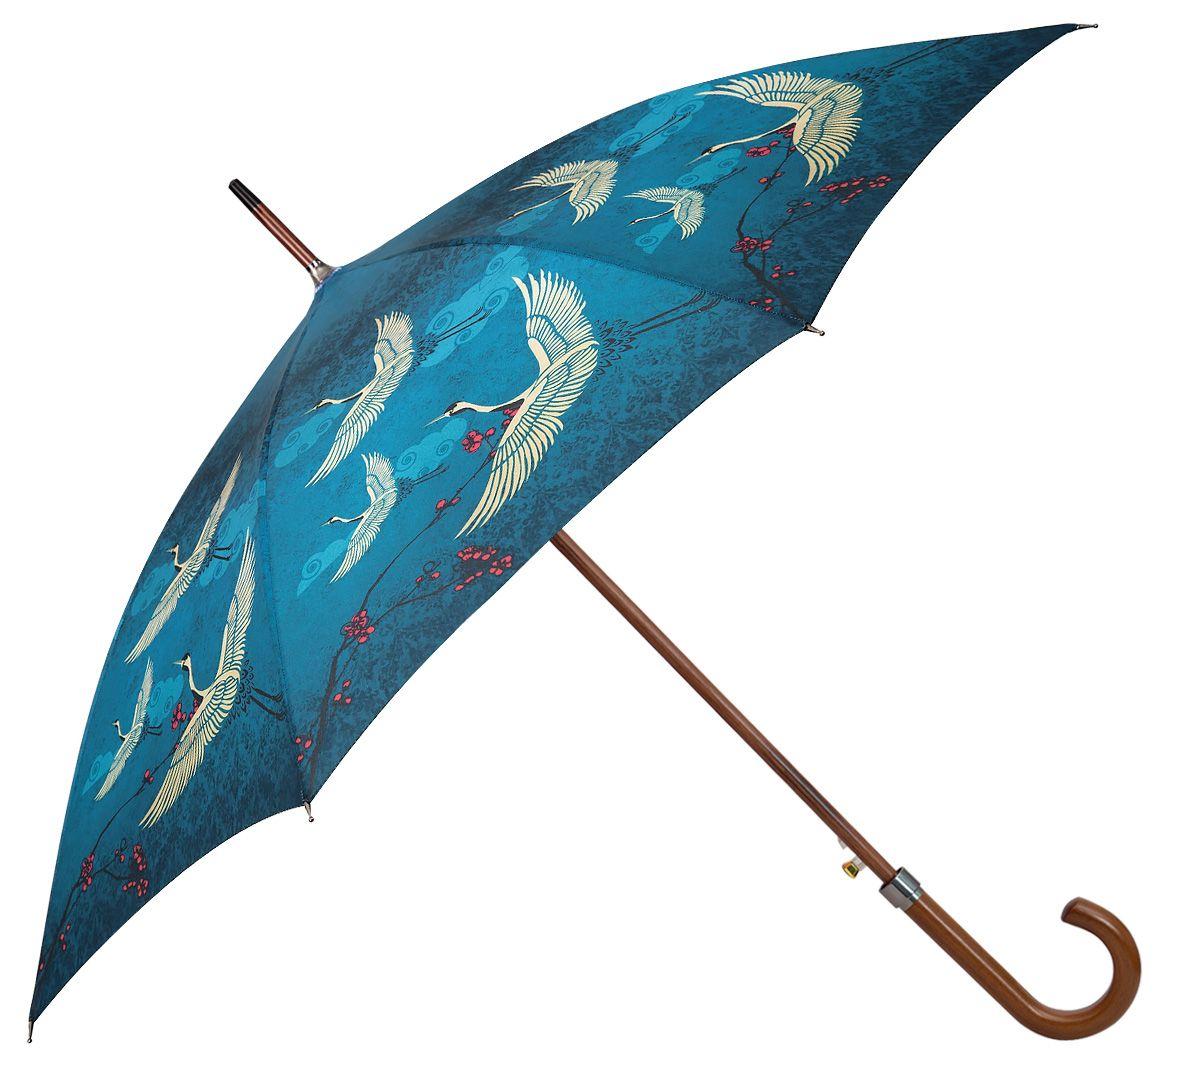 Modish Umbrellas for Women